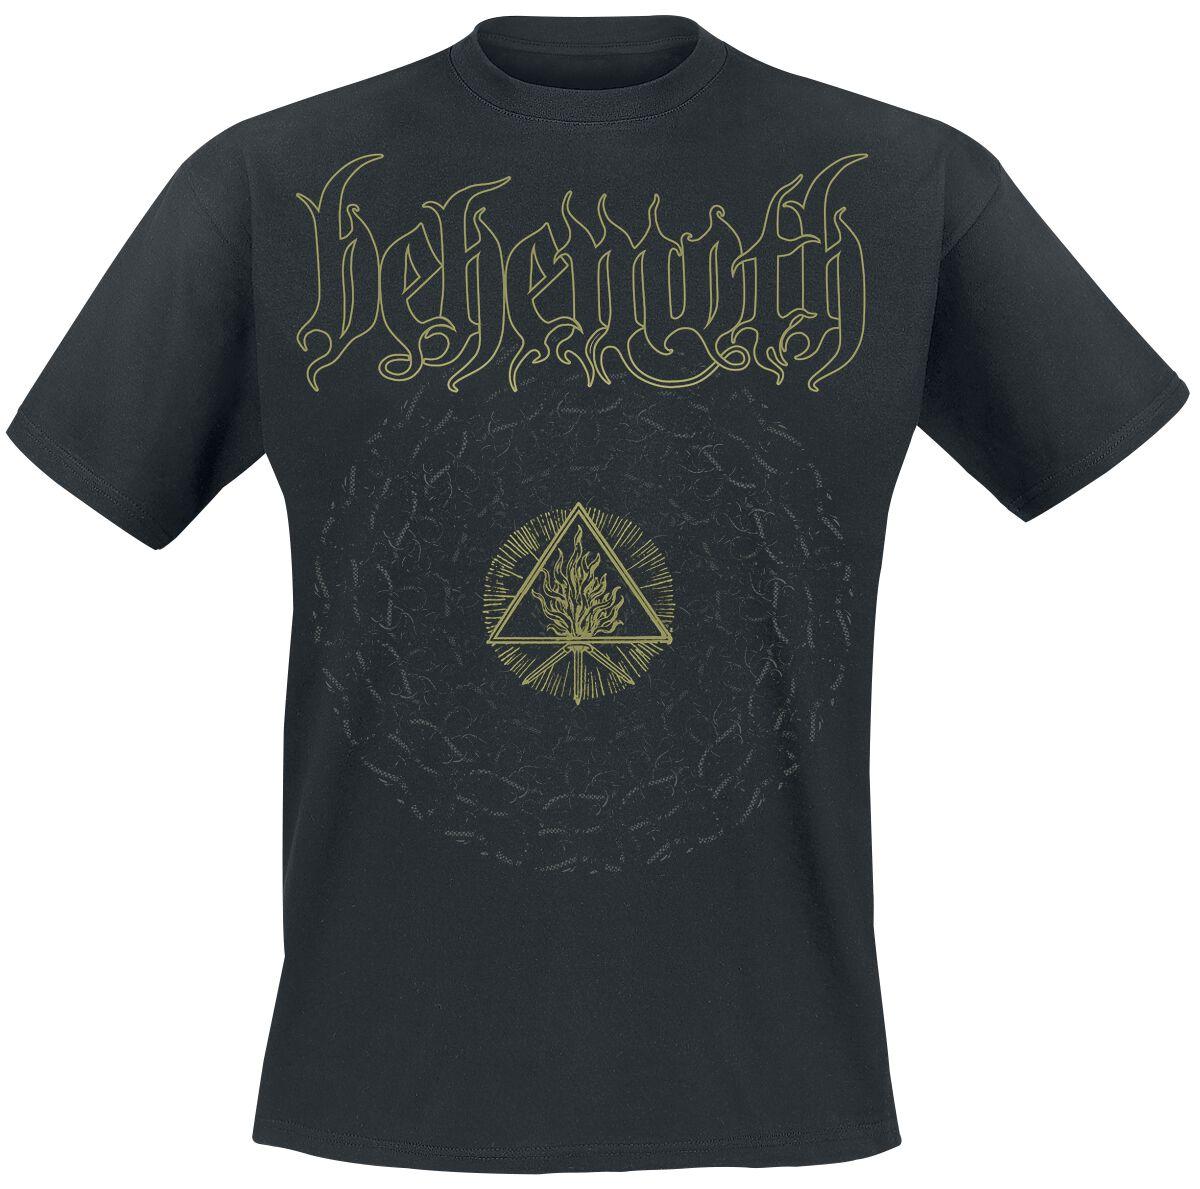 Zespoły - Koszulki - T-Shirt Behemoth Pit Ov Snakes T-Shirt czarny - 370736